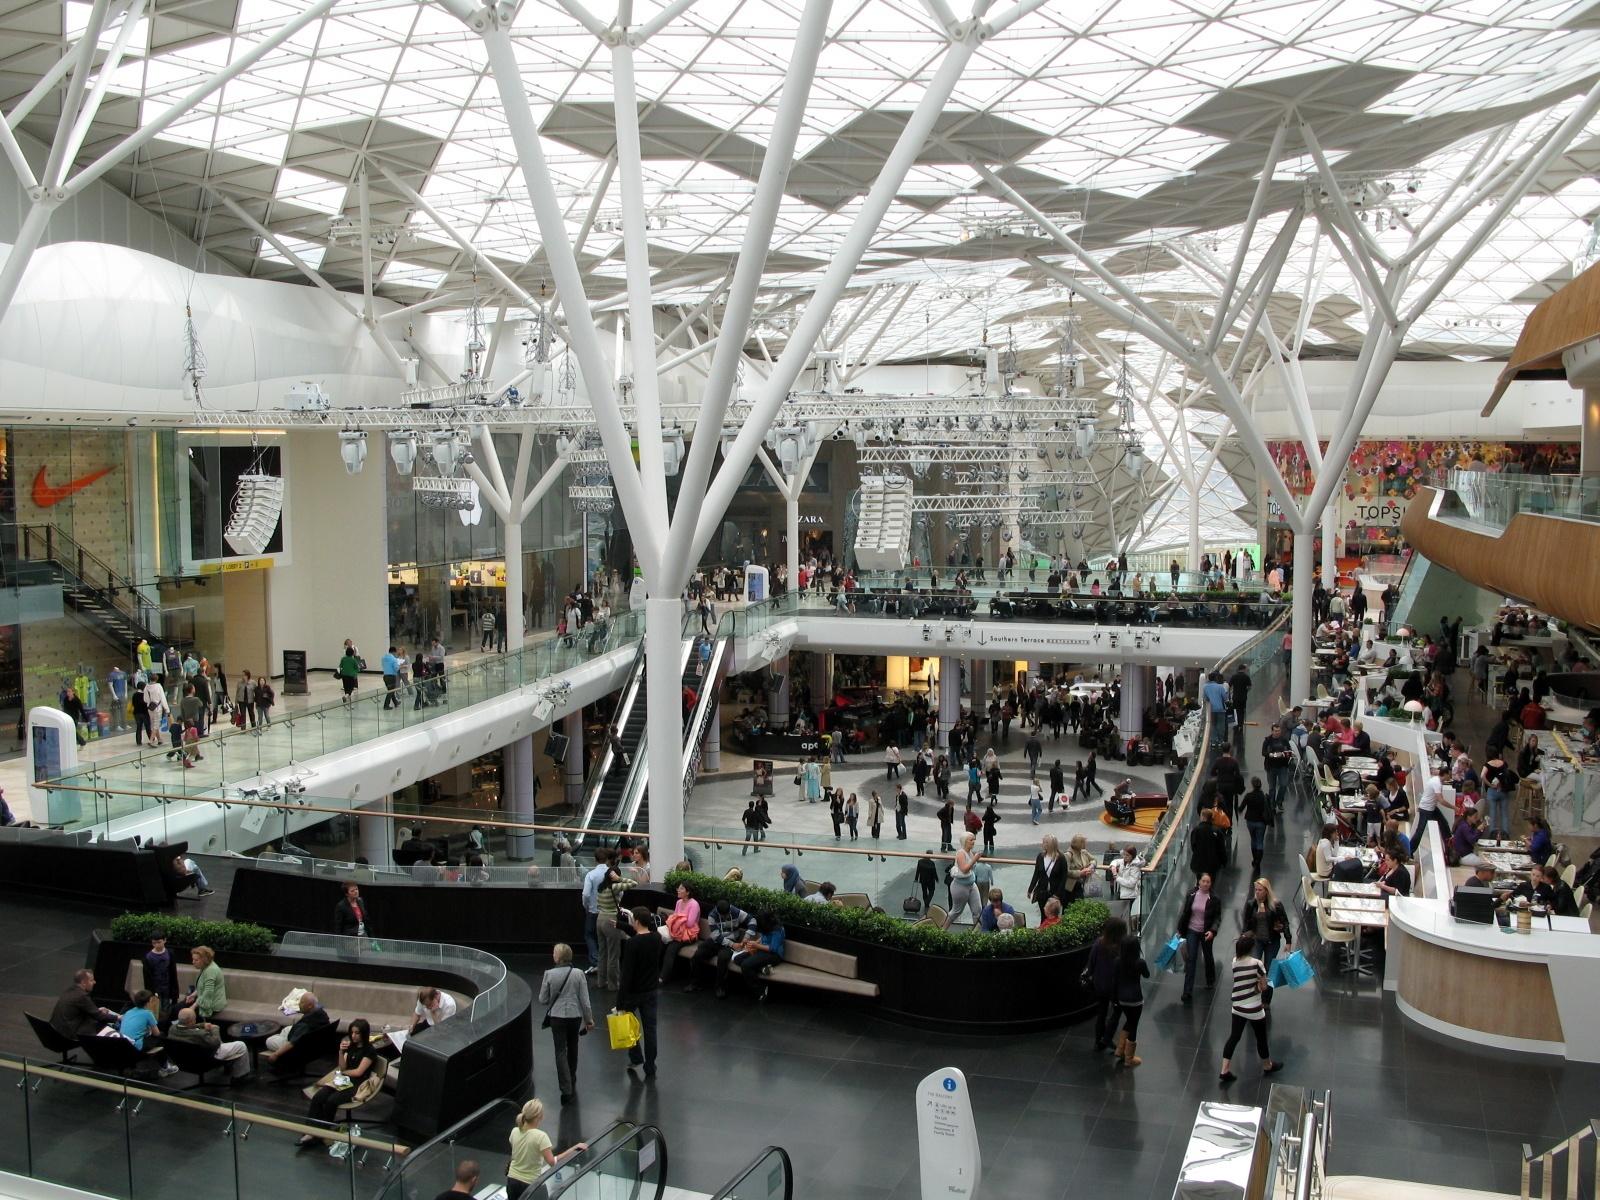 Westfield_London_Main_Atrium_2009.jpg